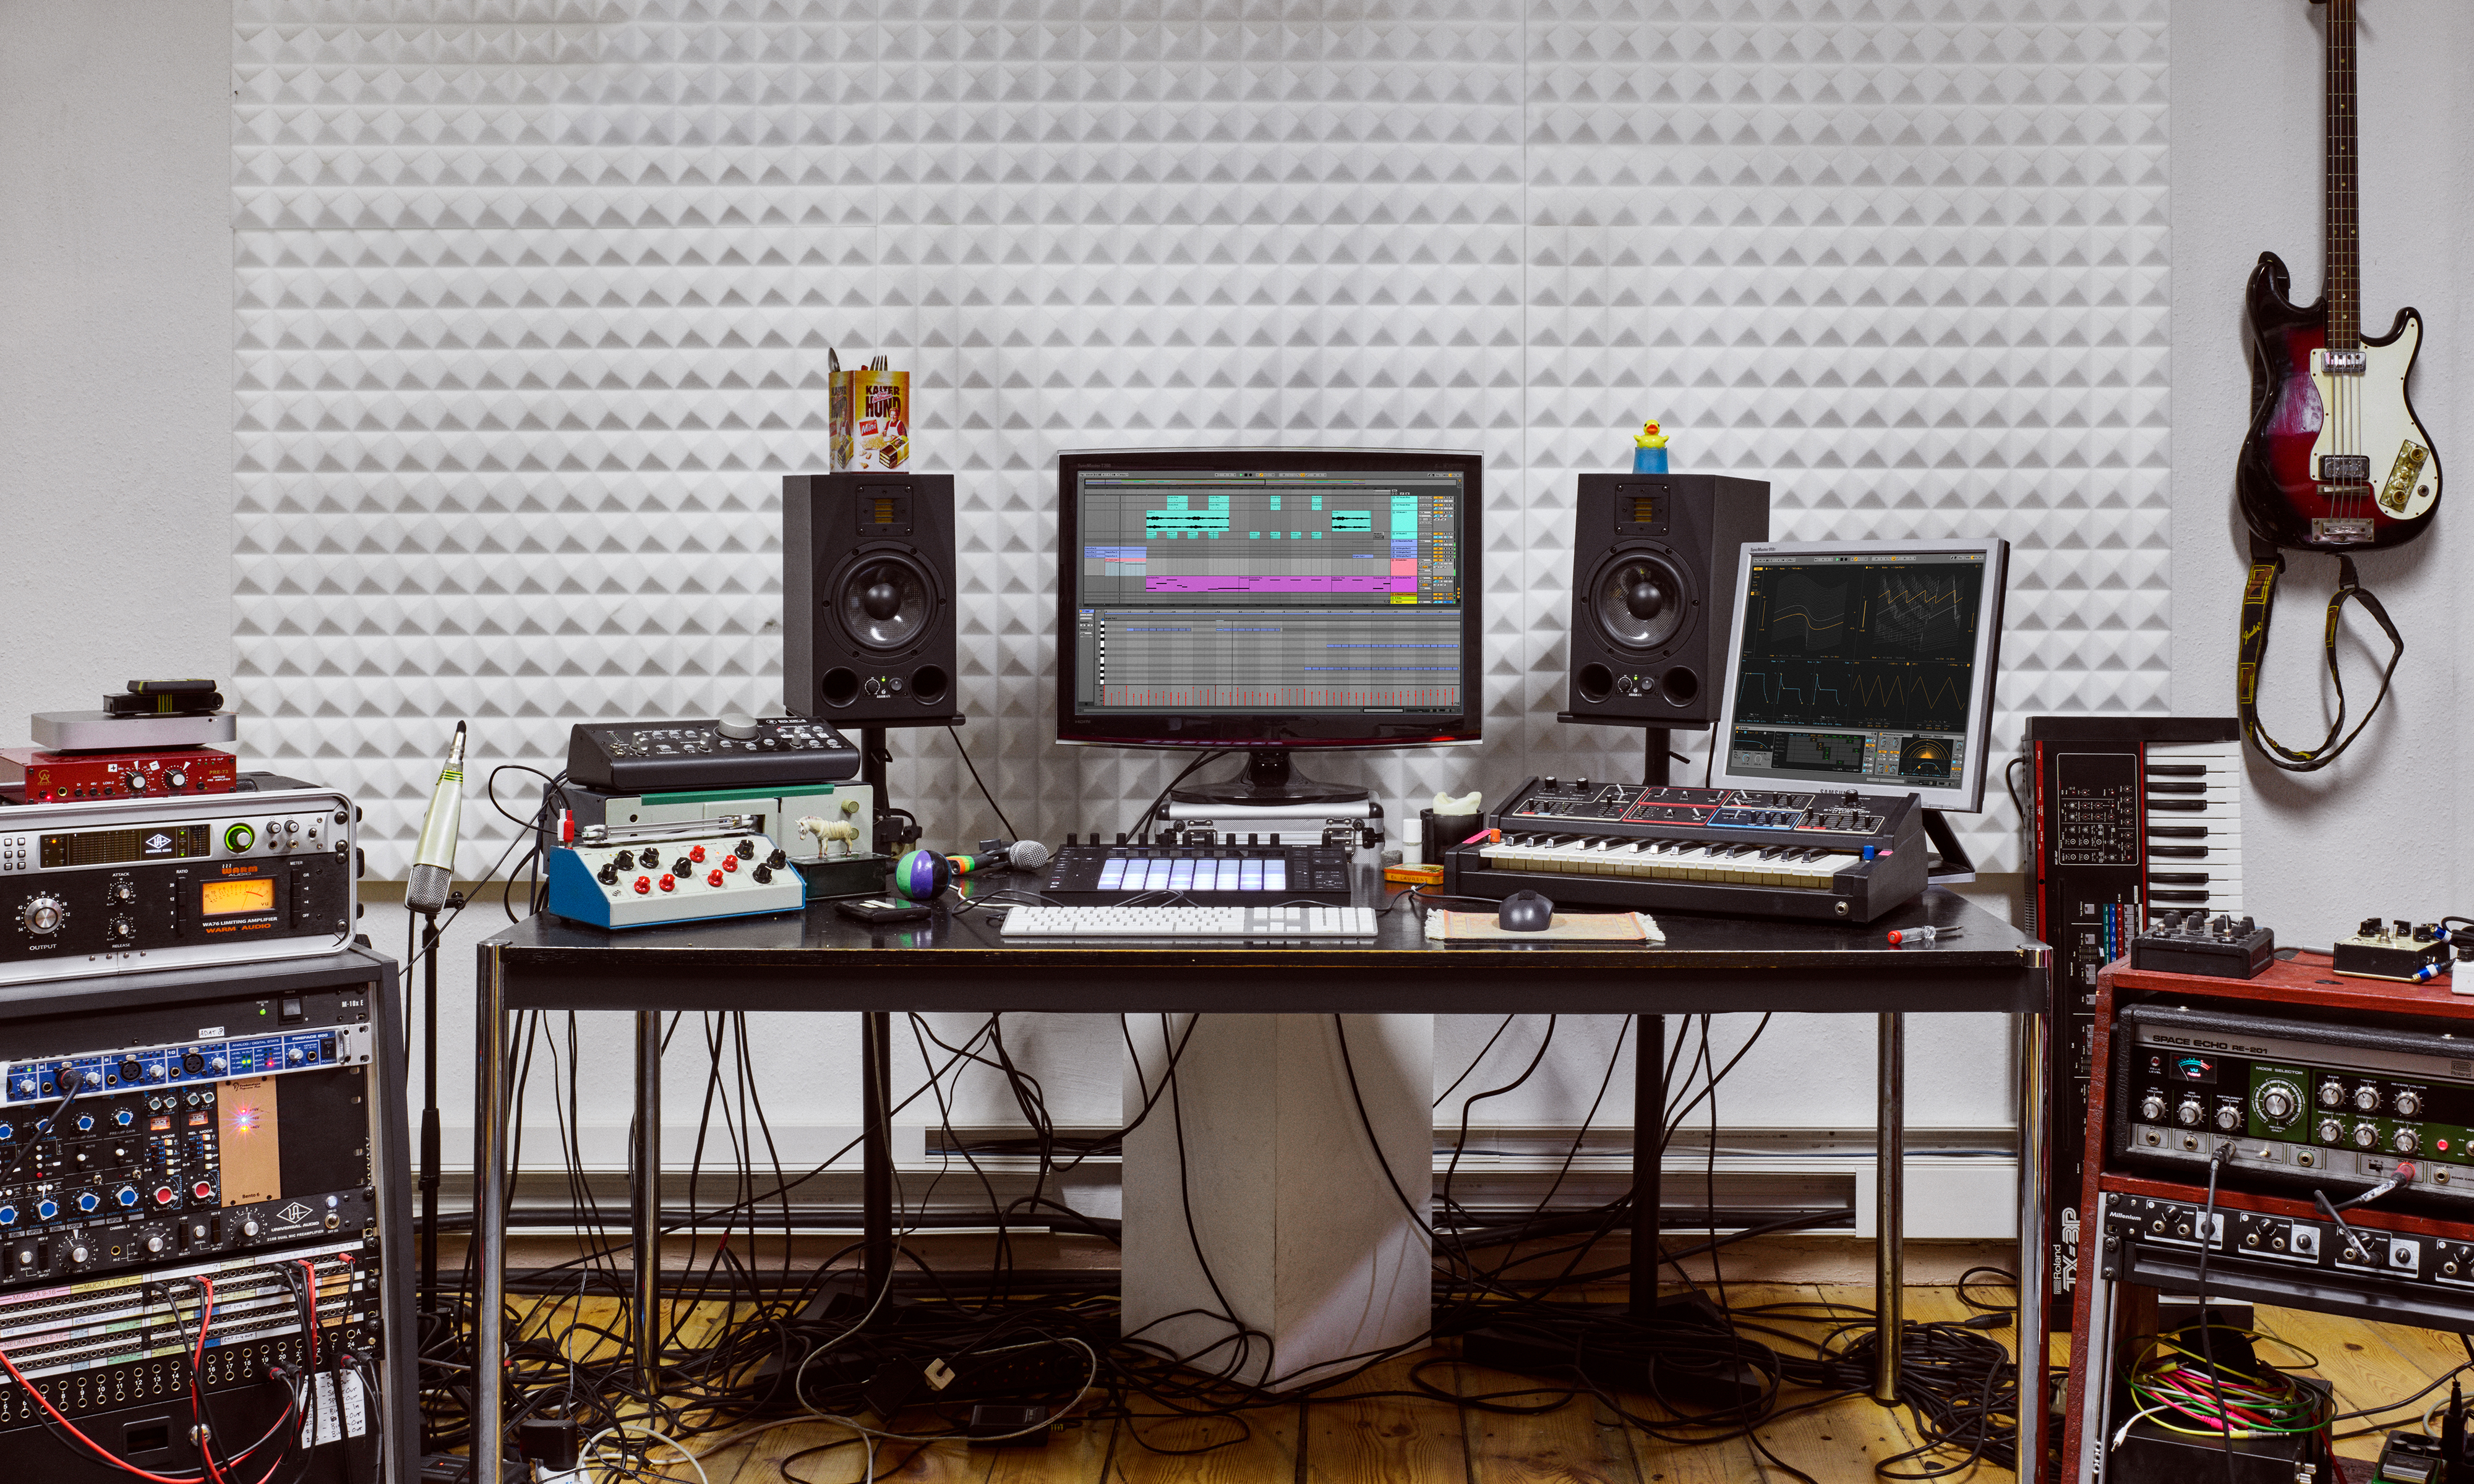 Ableton Live 10 Suite Mac 破解版 音乐创作软件套装-麦氪派(WaitsUn.com | 爱情守望者)